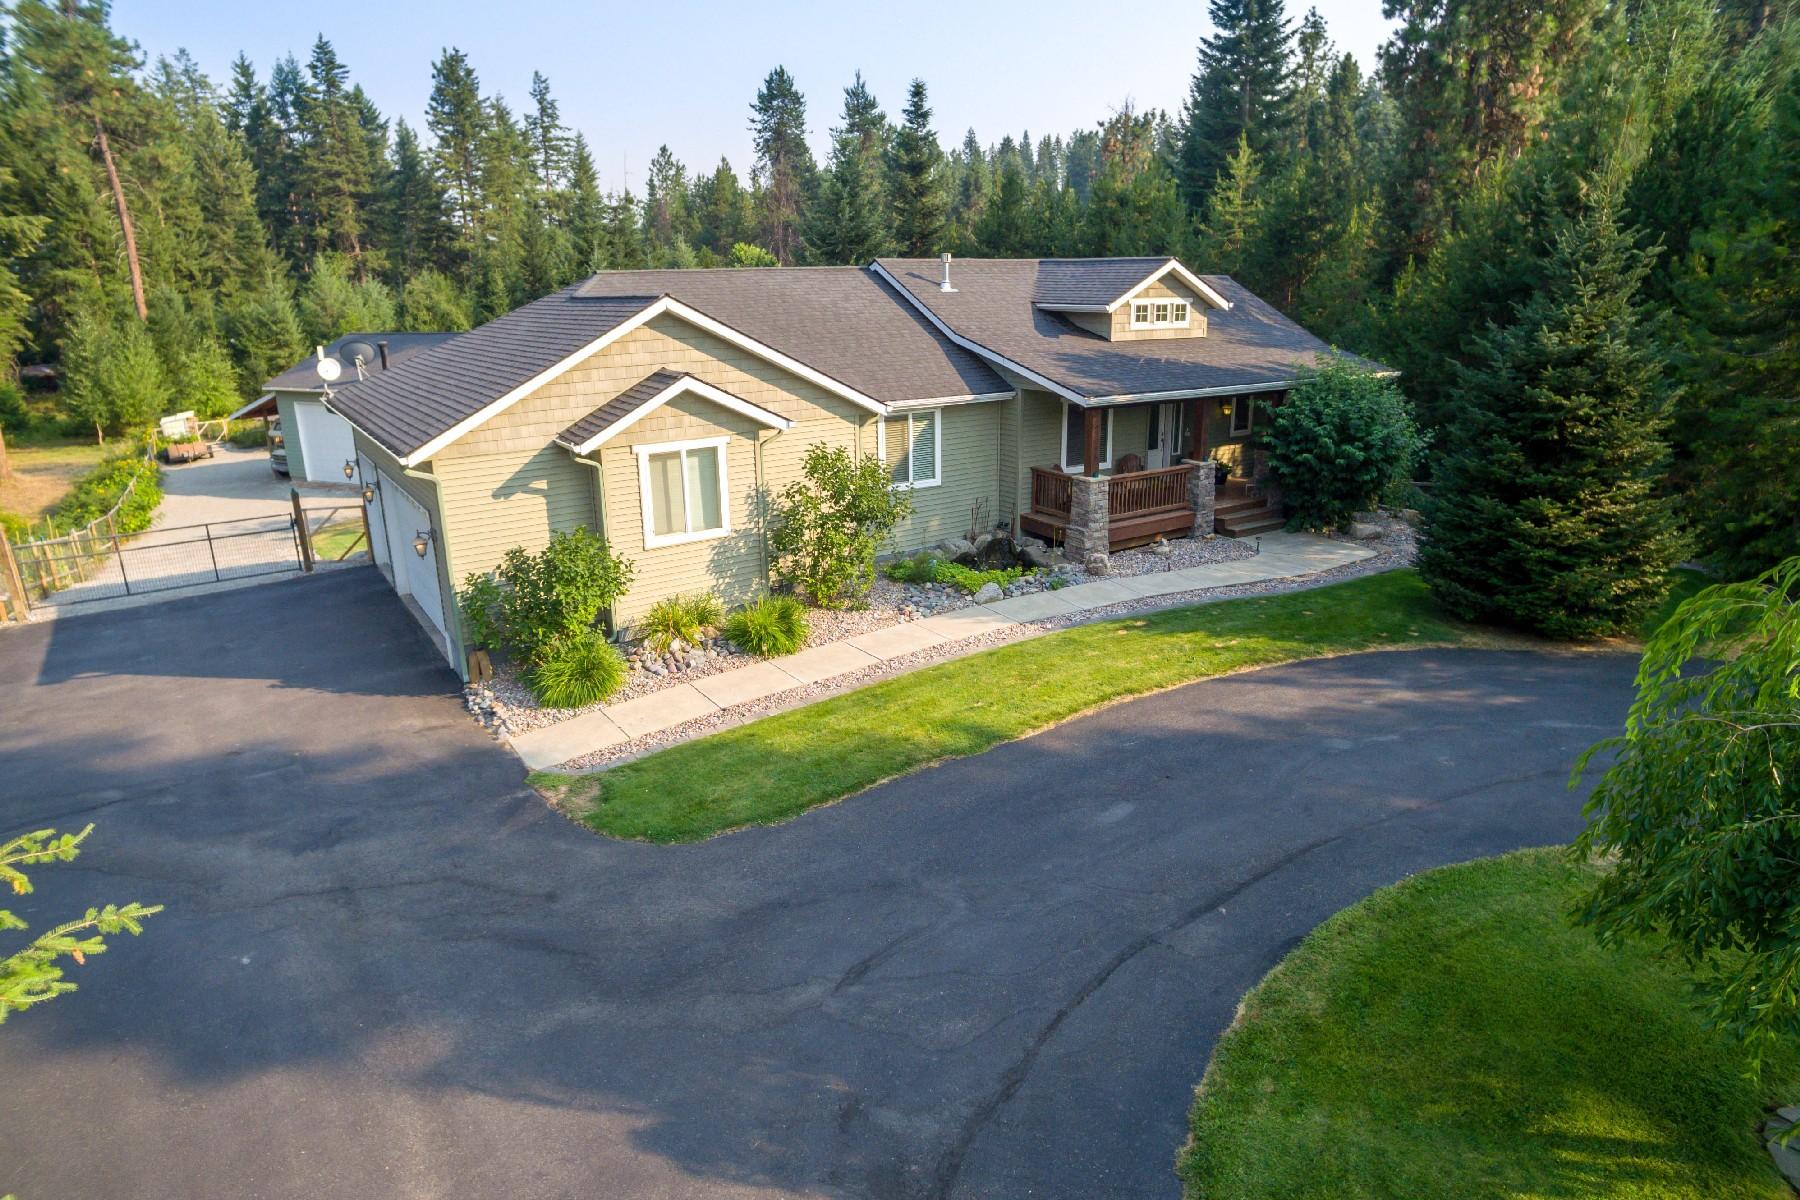 Single Family Homes pour l Vente à Craftsman Beauty with Shop and Acreage 12345 N Nine Bark Rd Hauser, Idaho 83854 États-Unis